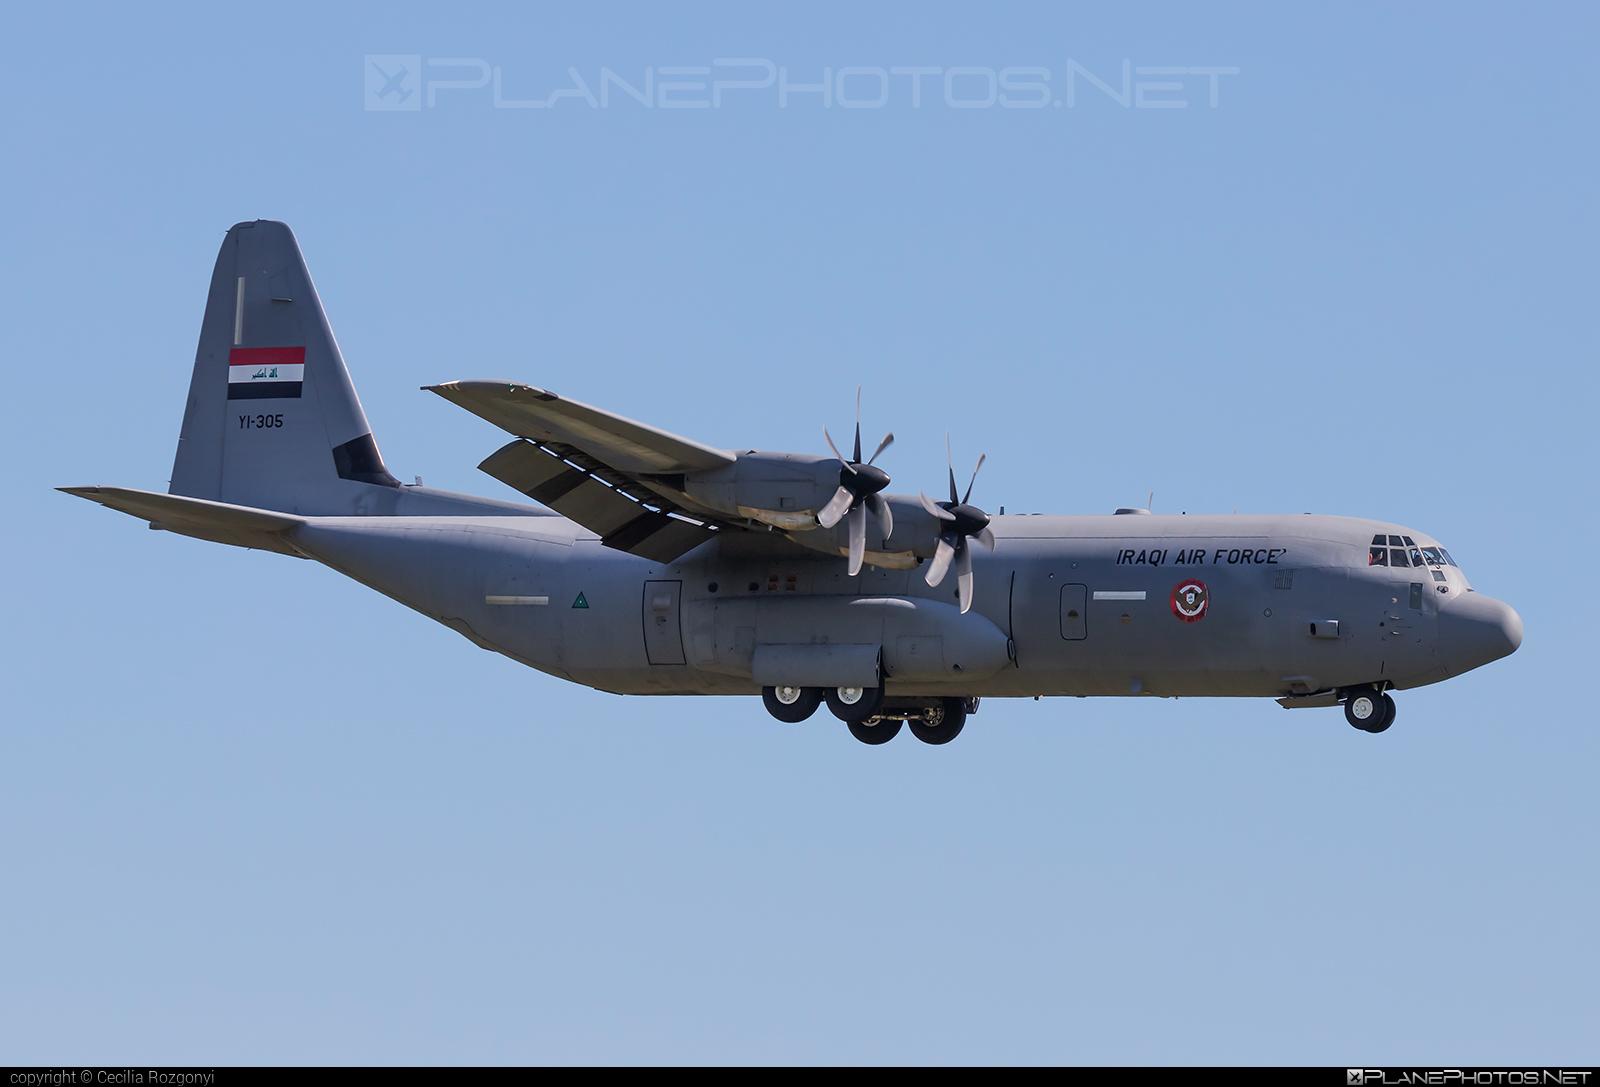 Lockheed Martin C-130J-30 Super Hercules - YI-305 operated by Al Quwwat al Jawwiya al Iraqiya (Iraqi Air Force) #alquwwataljawwiyaaliraqiya #c130 #c130j #c130j30 #iraqiairforce #lockheedmartin #superhercules